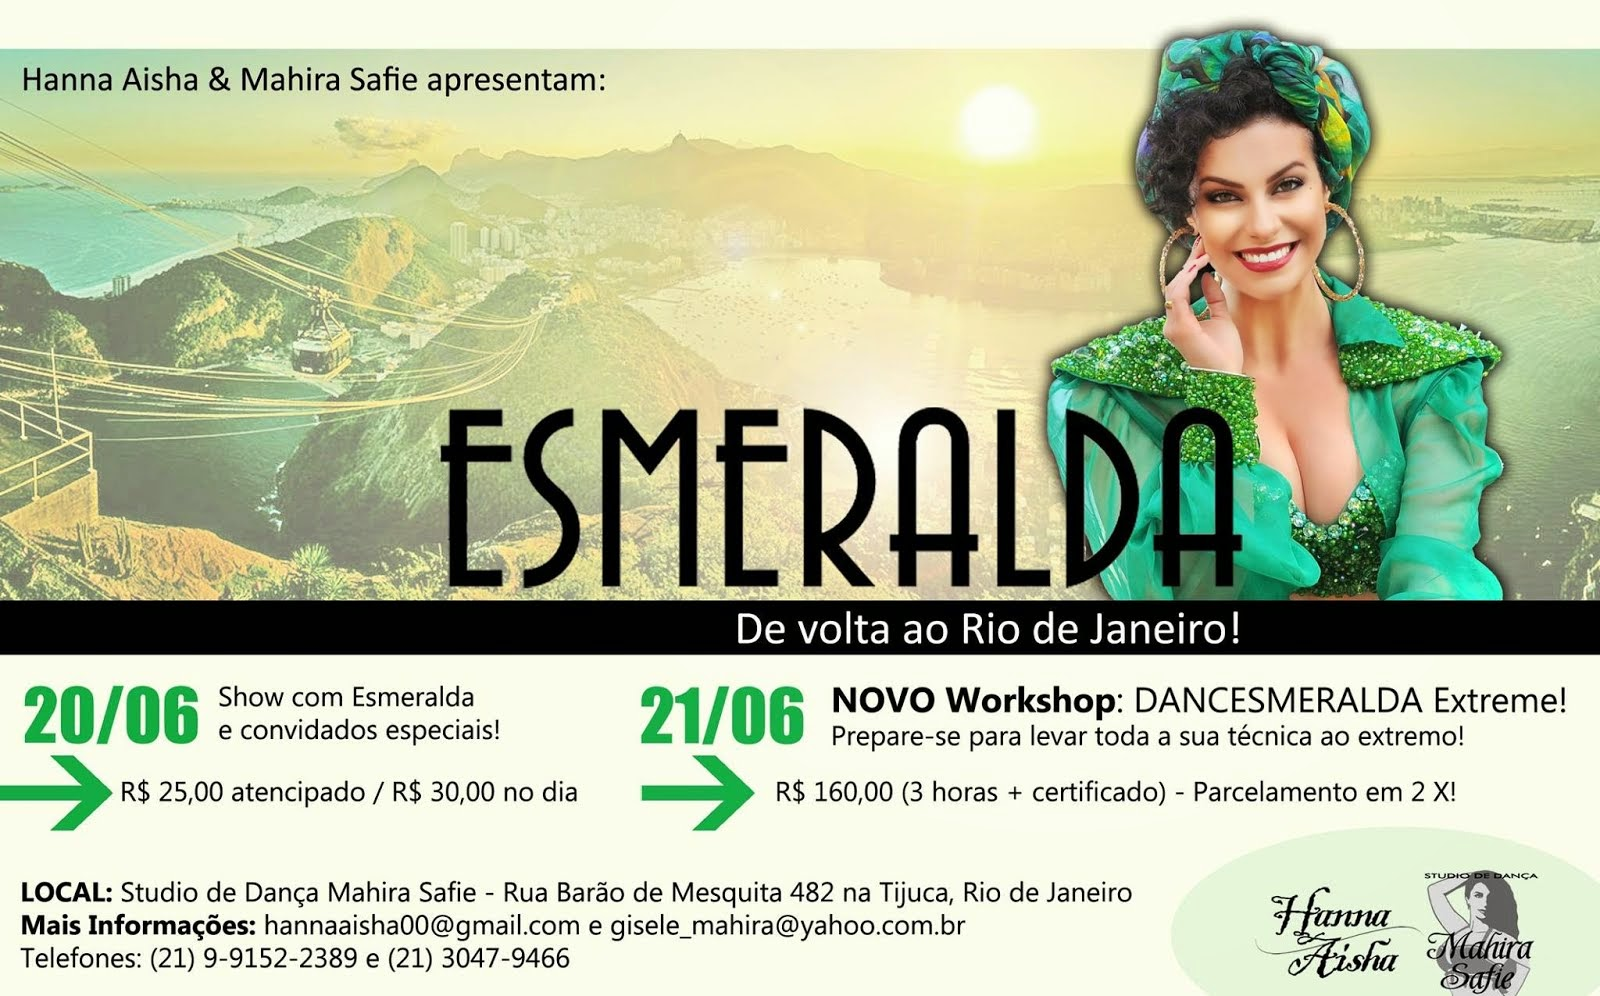 Esmeralda de volta ao RJ!